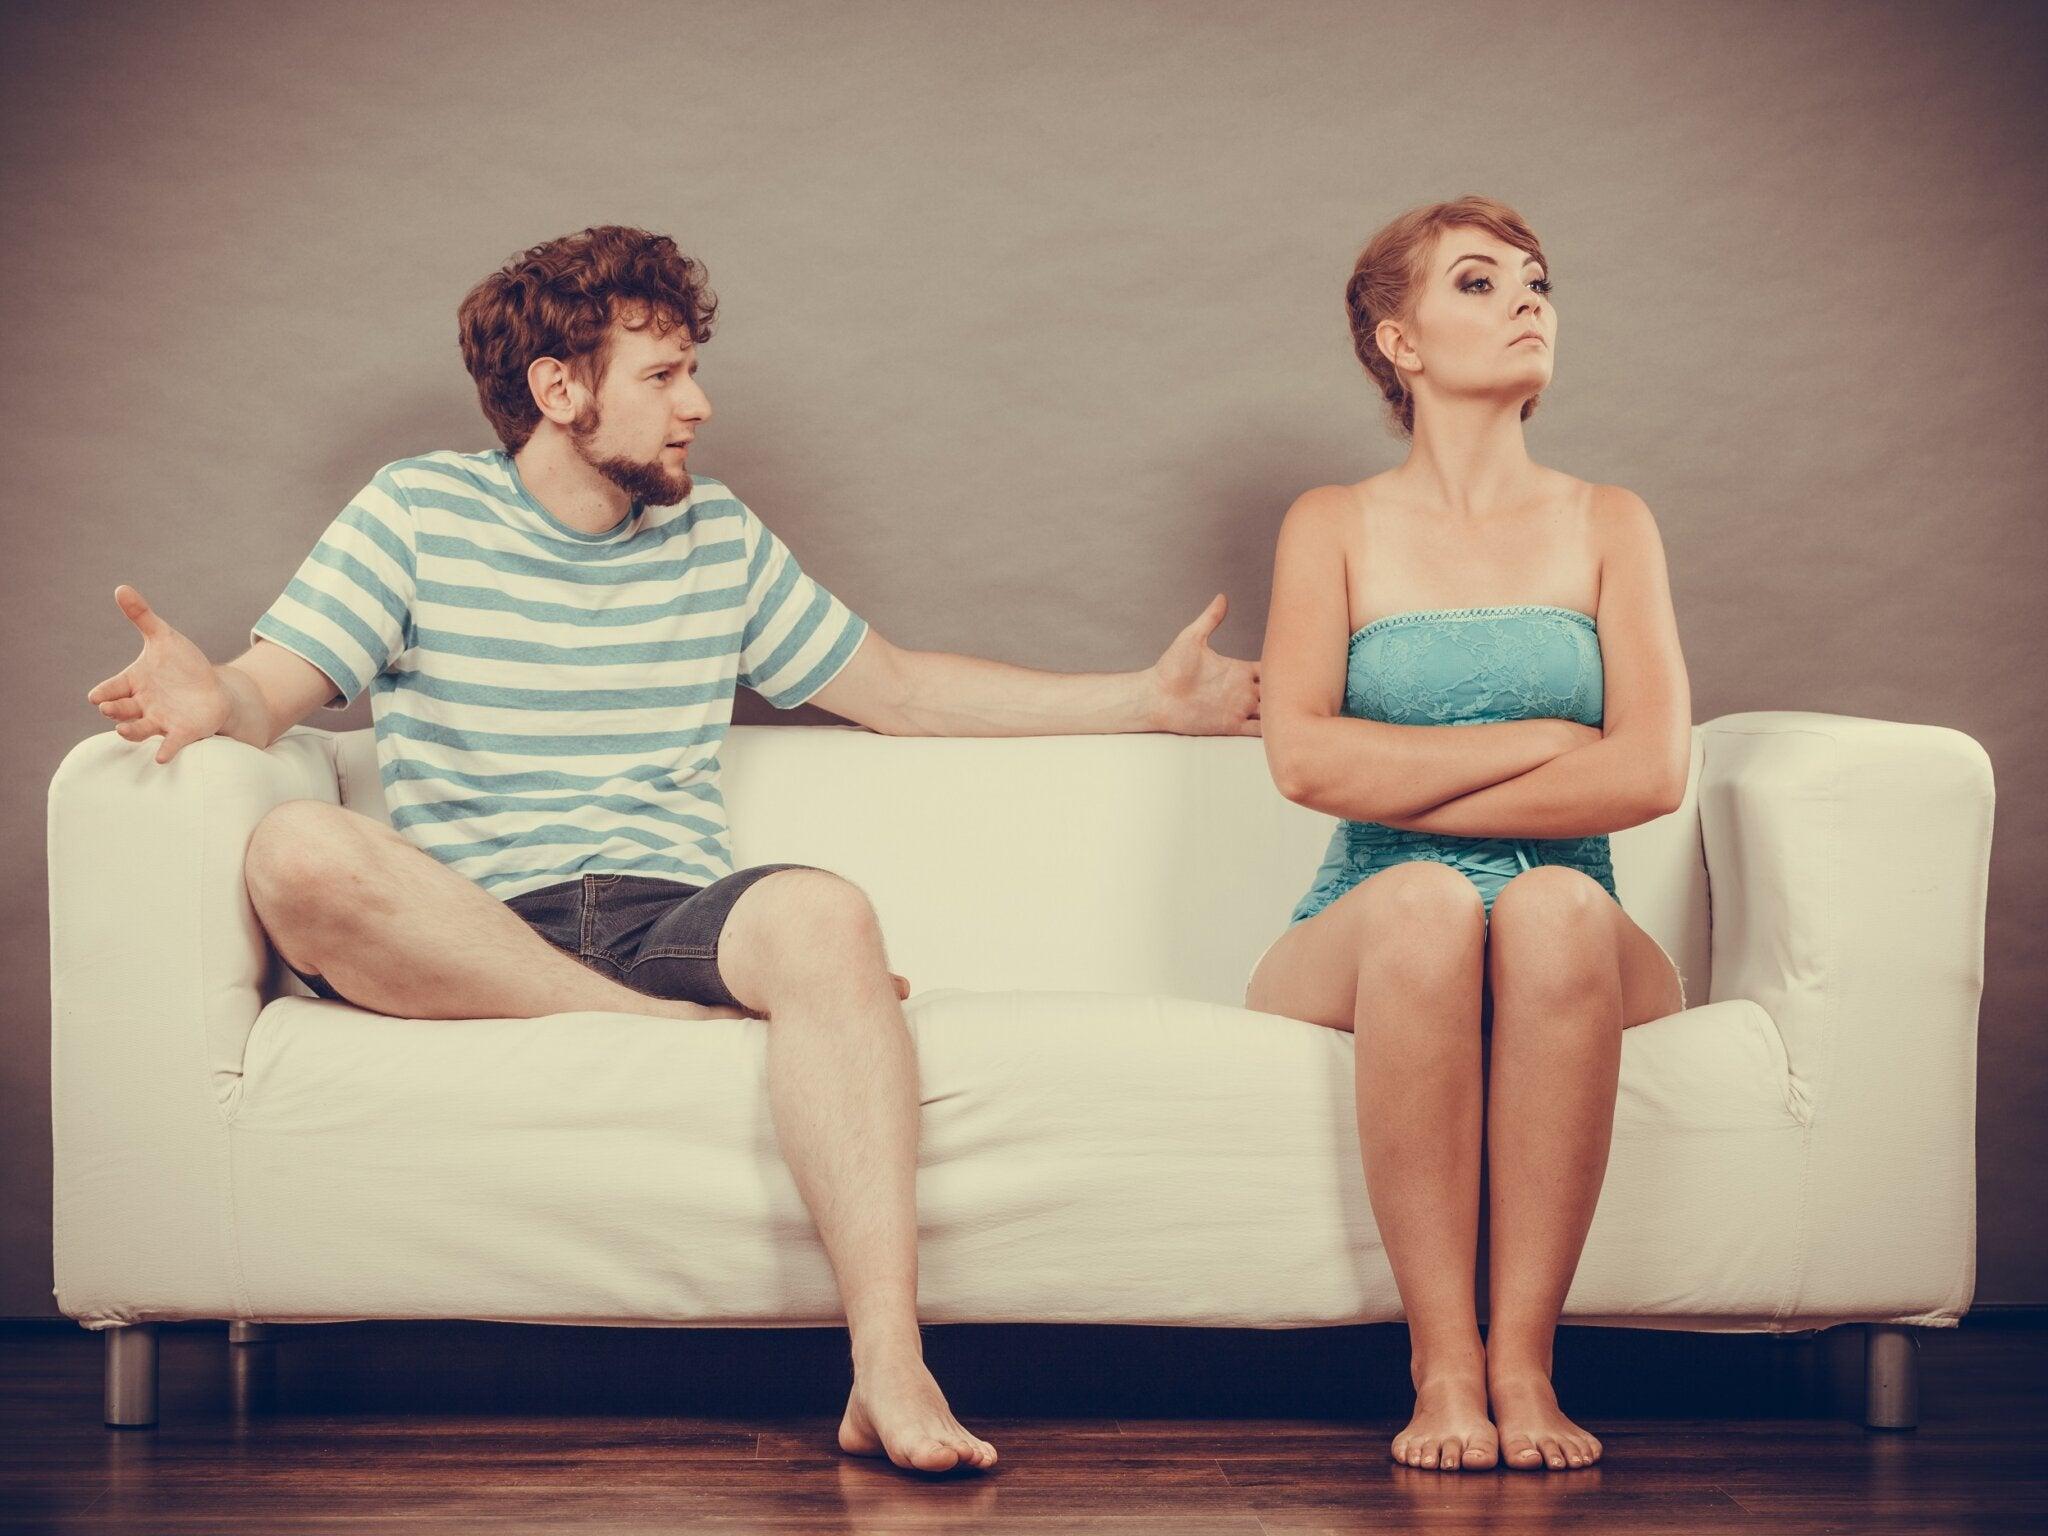 pareja enfadada discutiendo